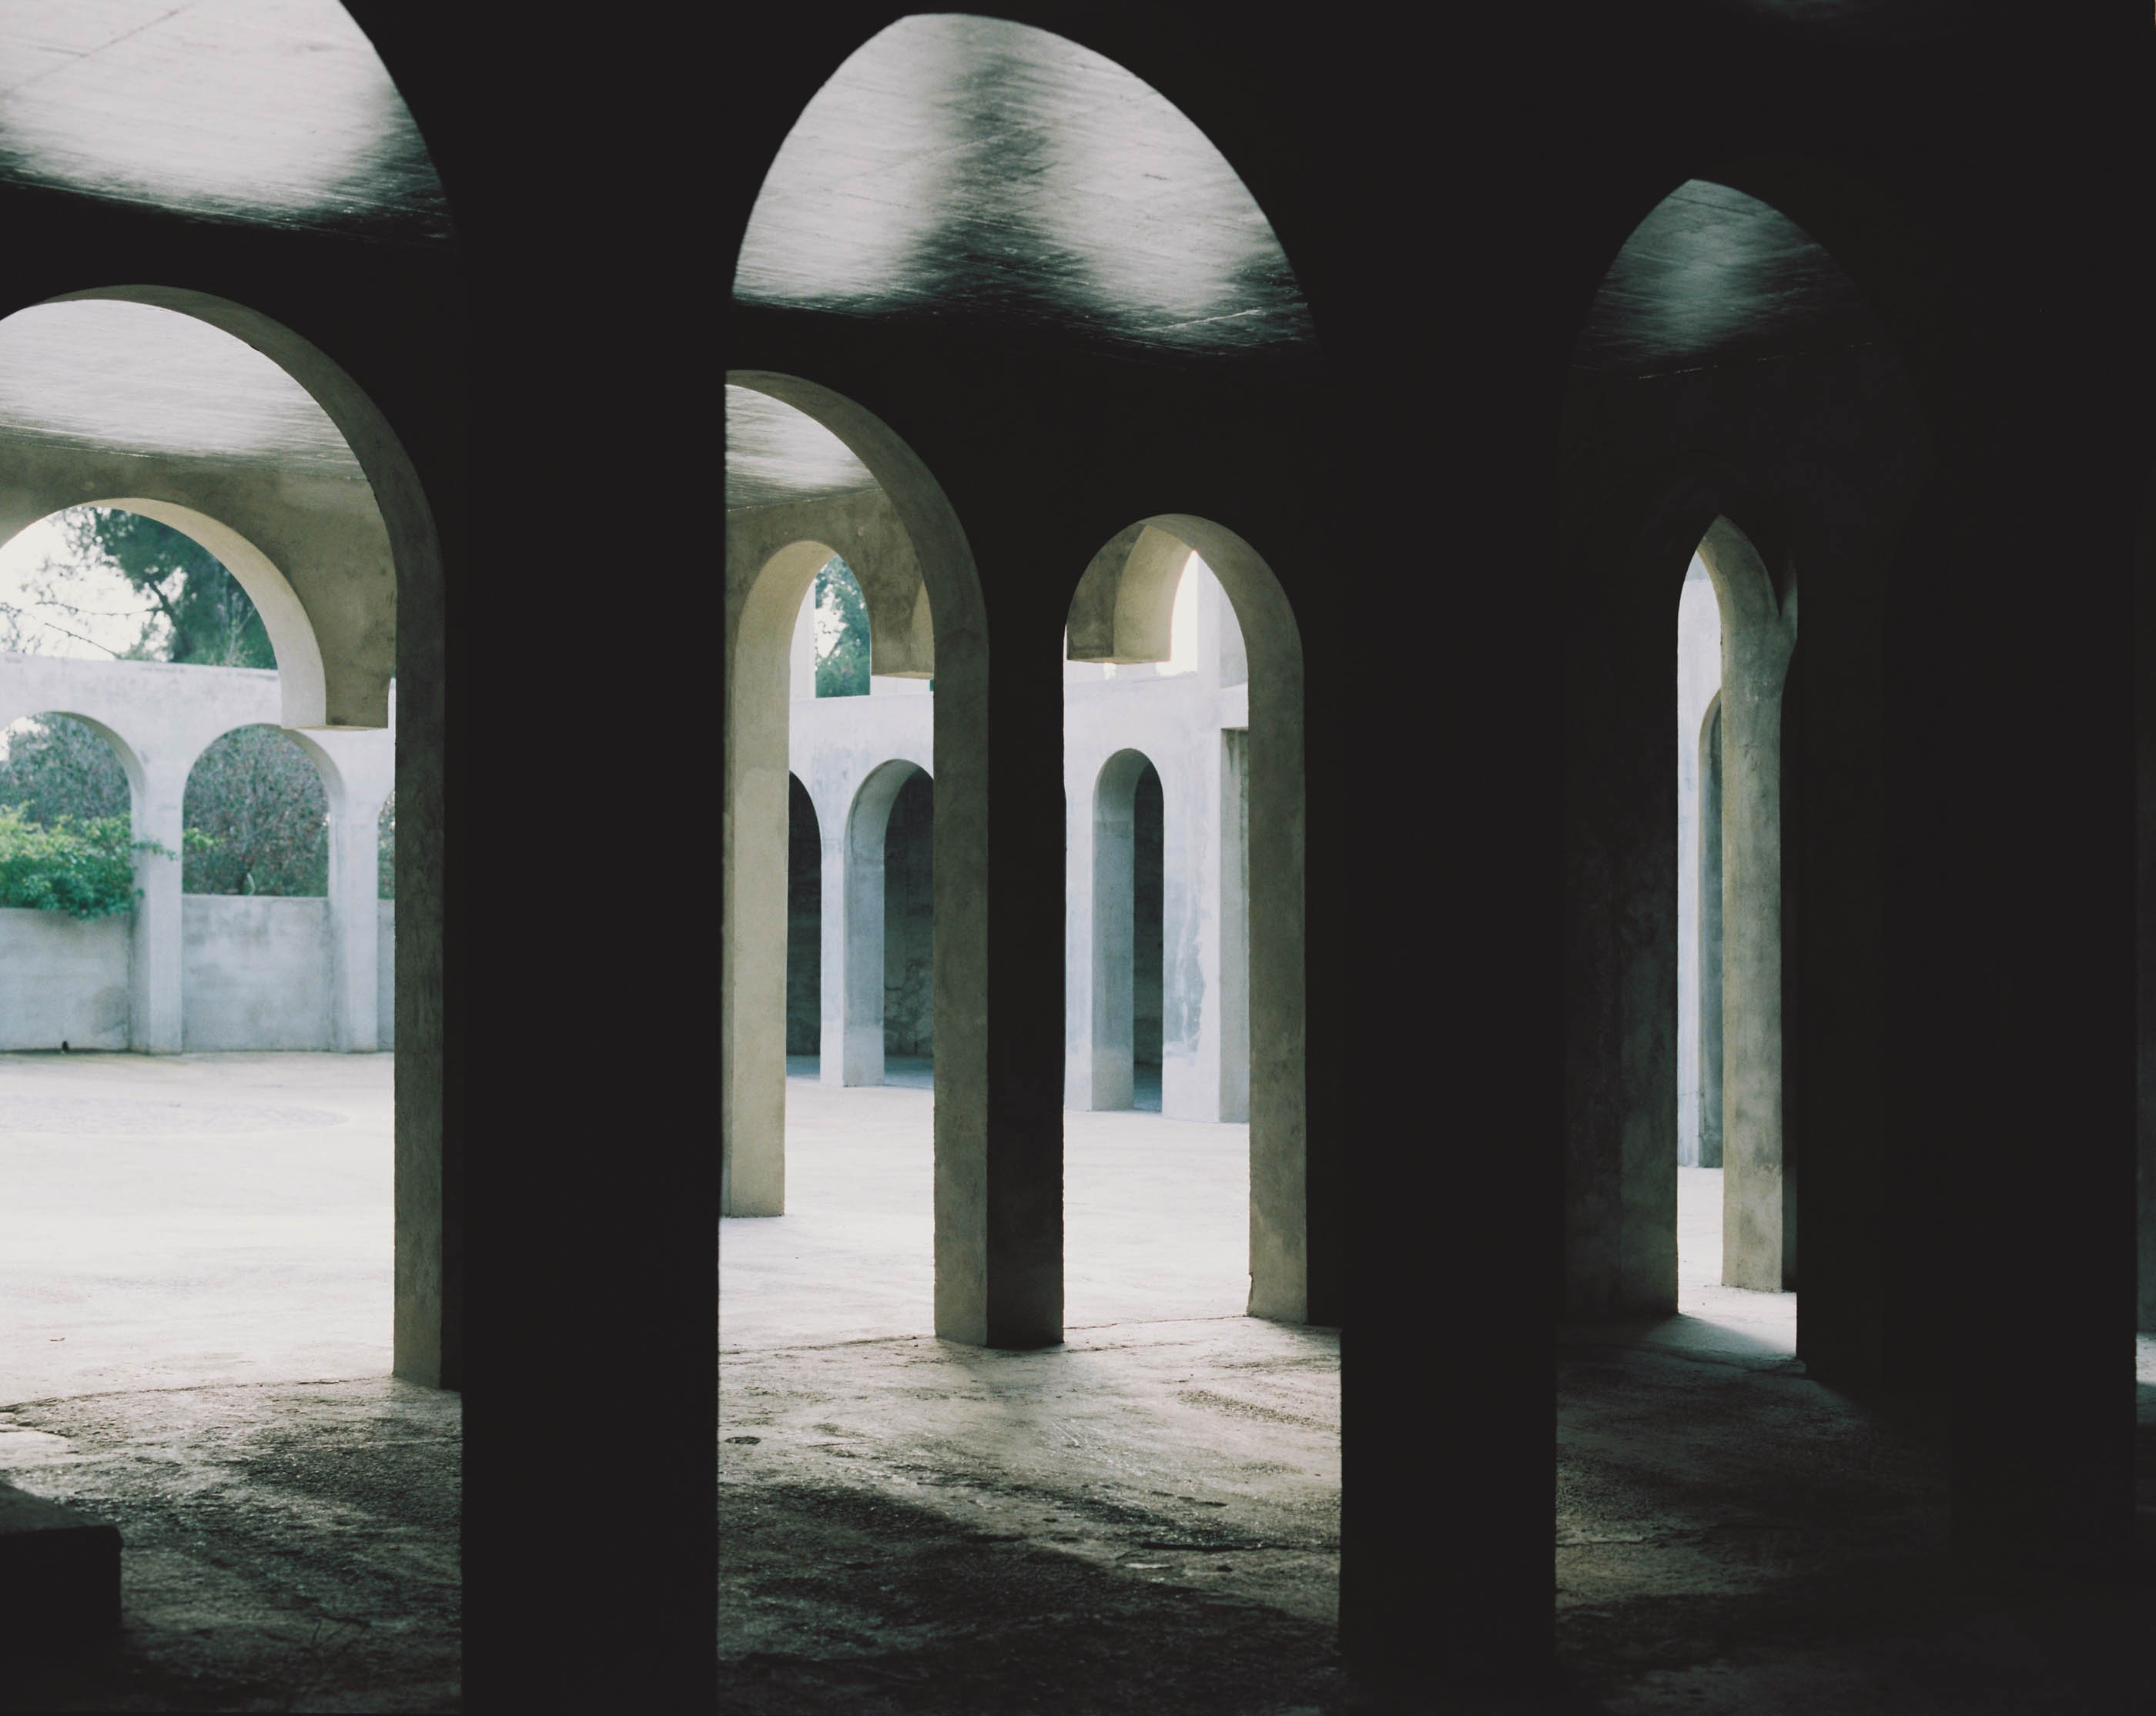 #editorial #xavier #corbero #architecture #wallstreetjournal